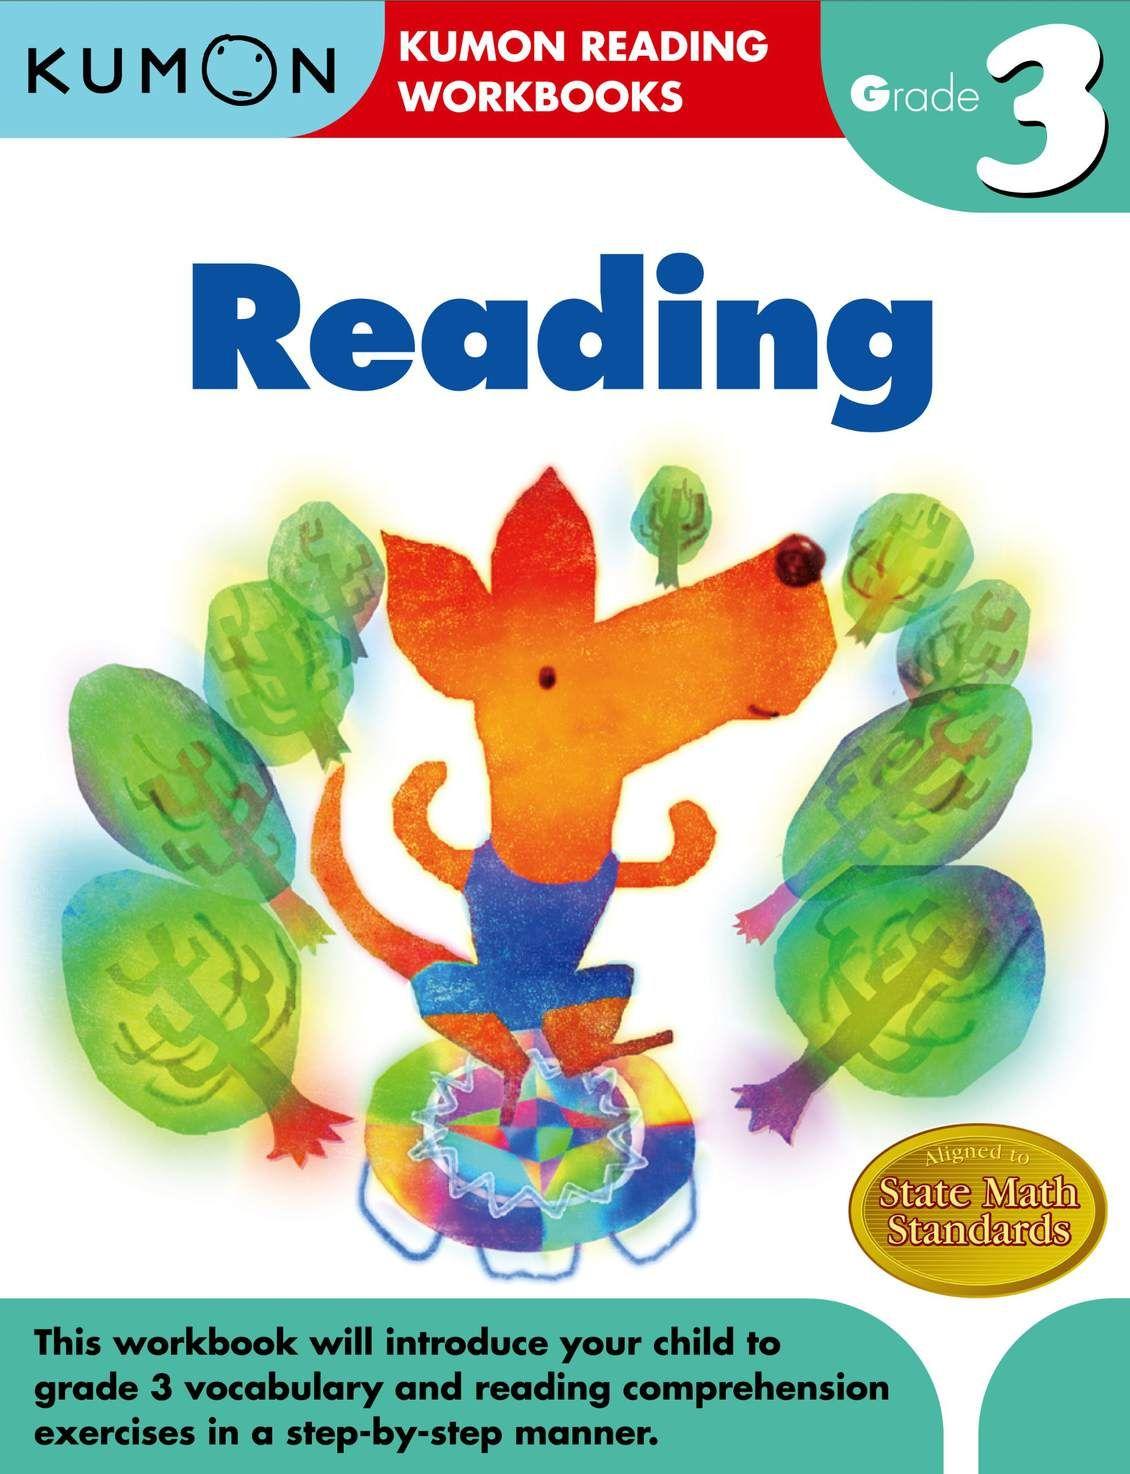 Third Grade Reading Comprehension Books Kumon Reading Comprehension Worksheets Phonics Free [ 1474 x 1130 Pixel ]